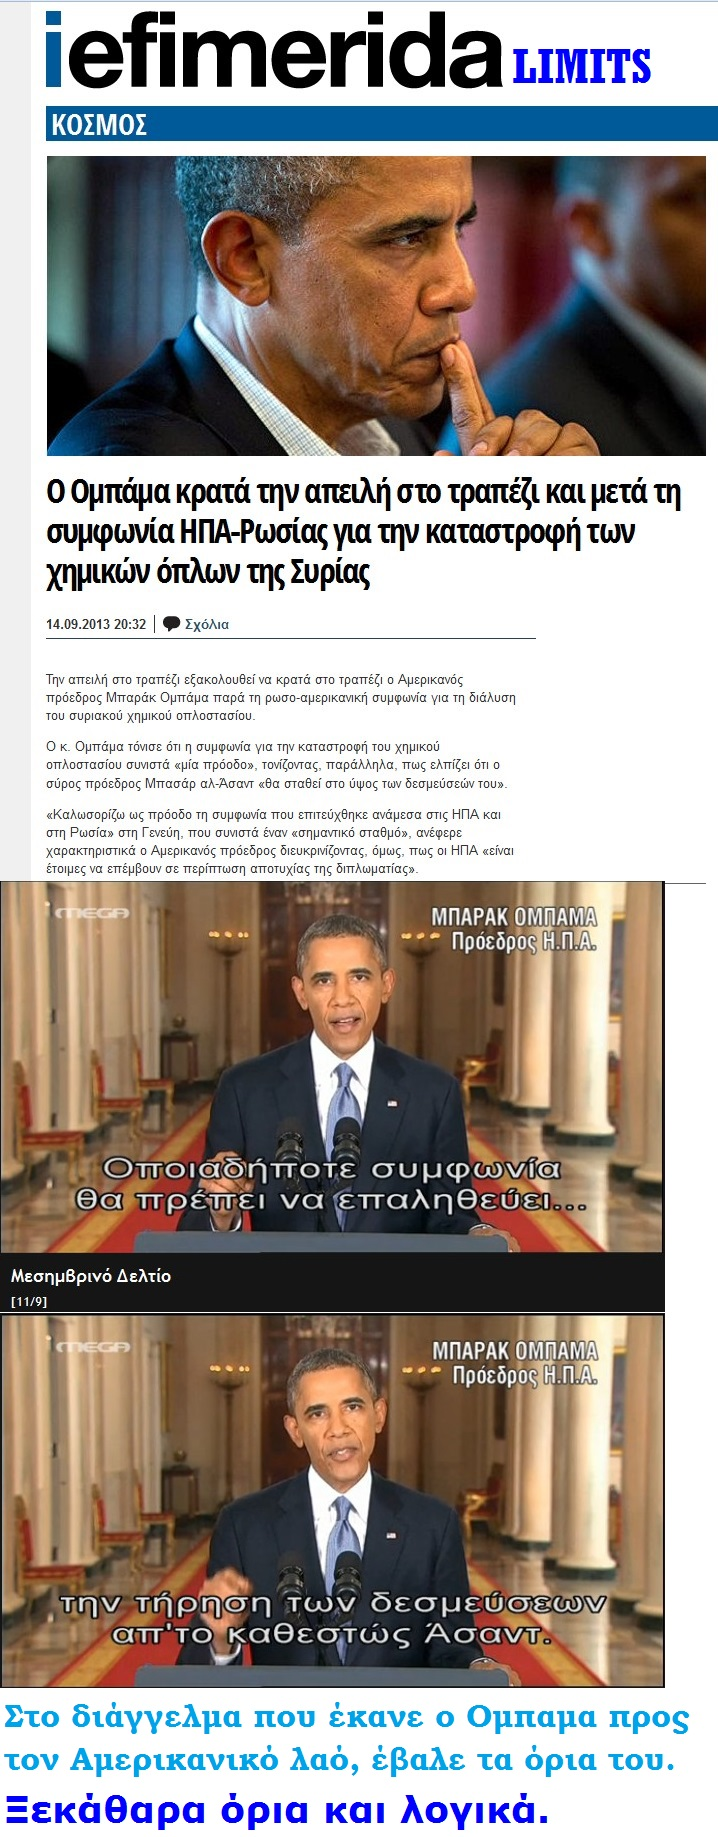 SYRIA CRISIS OBAMA LIMITS 02 140913